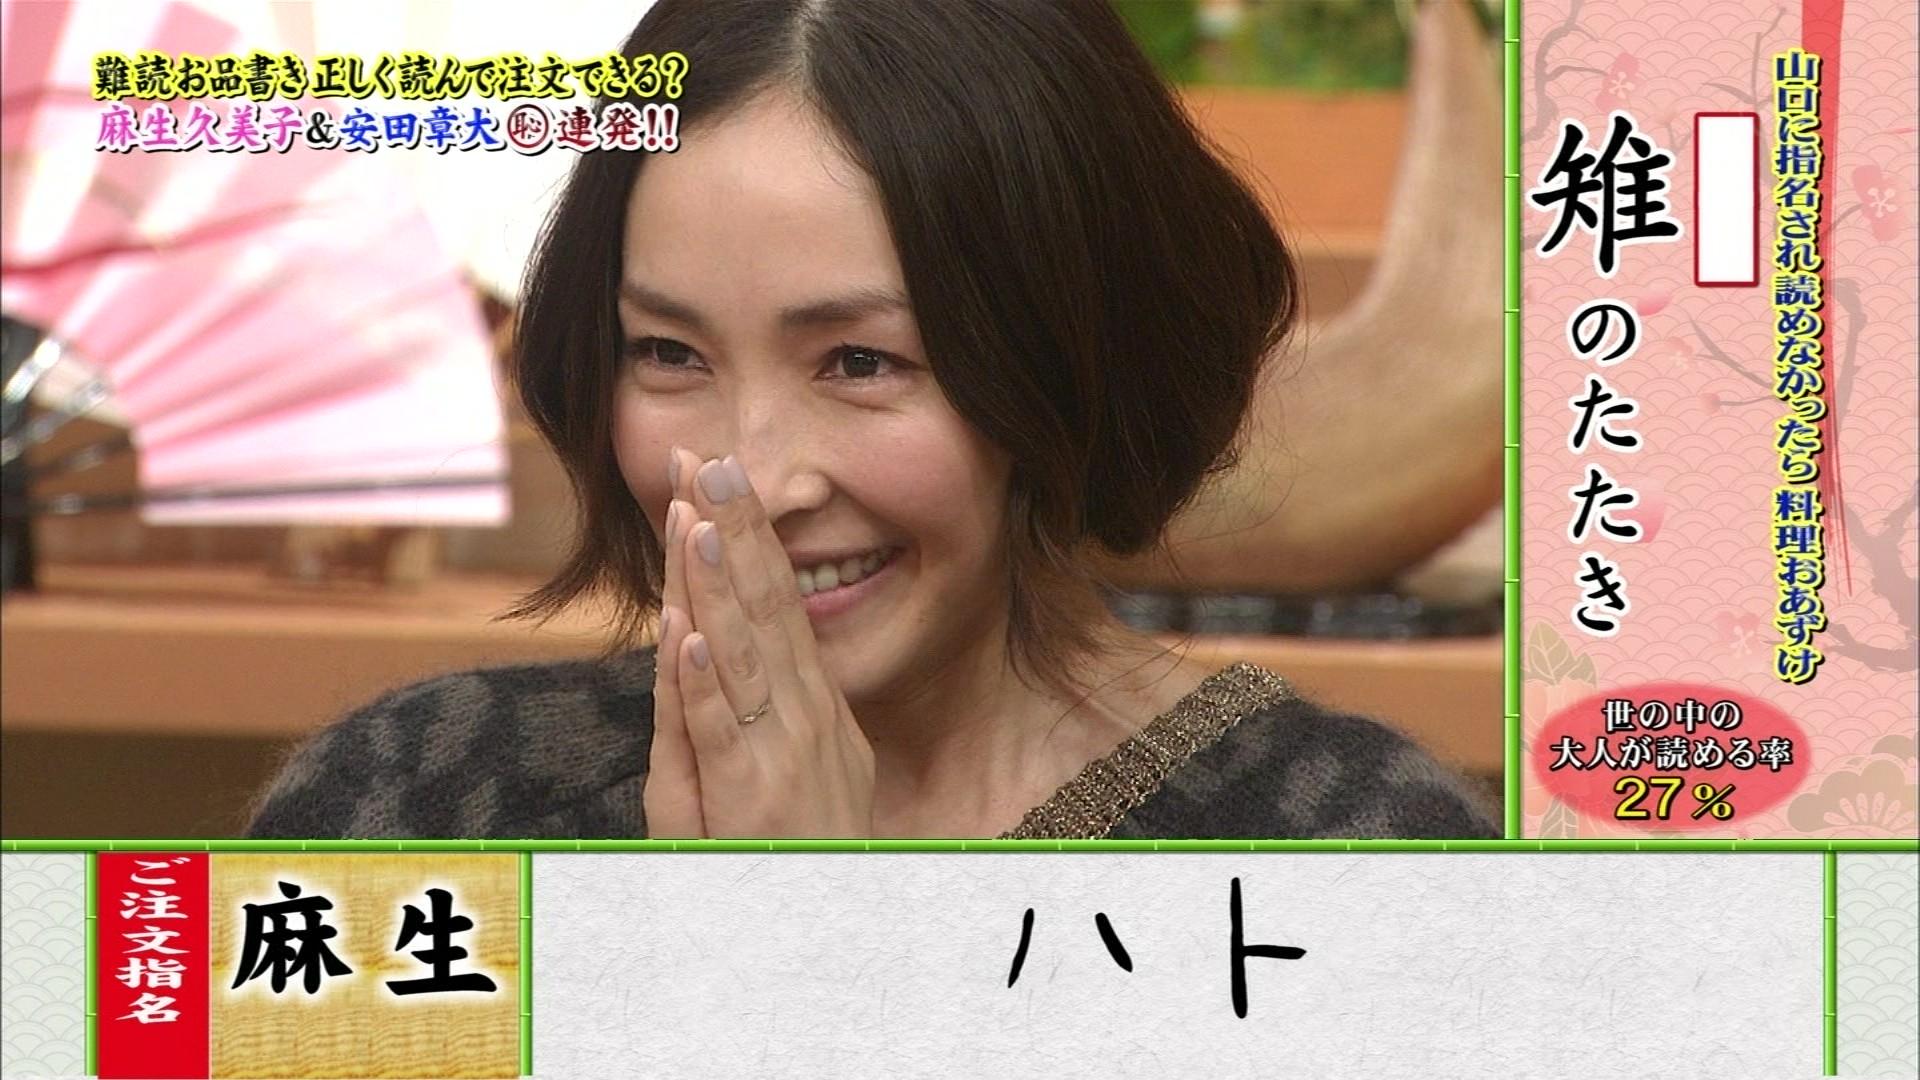 TOKIOカケル 麻生久美子 : こんなテレビを見た。